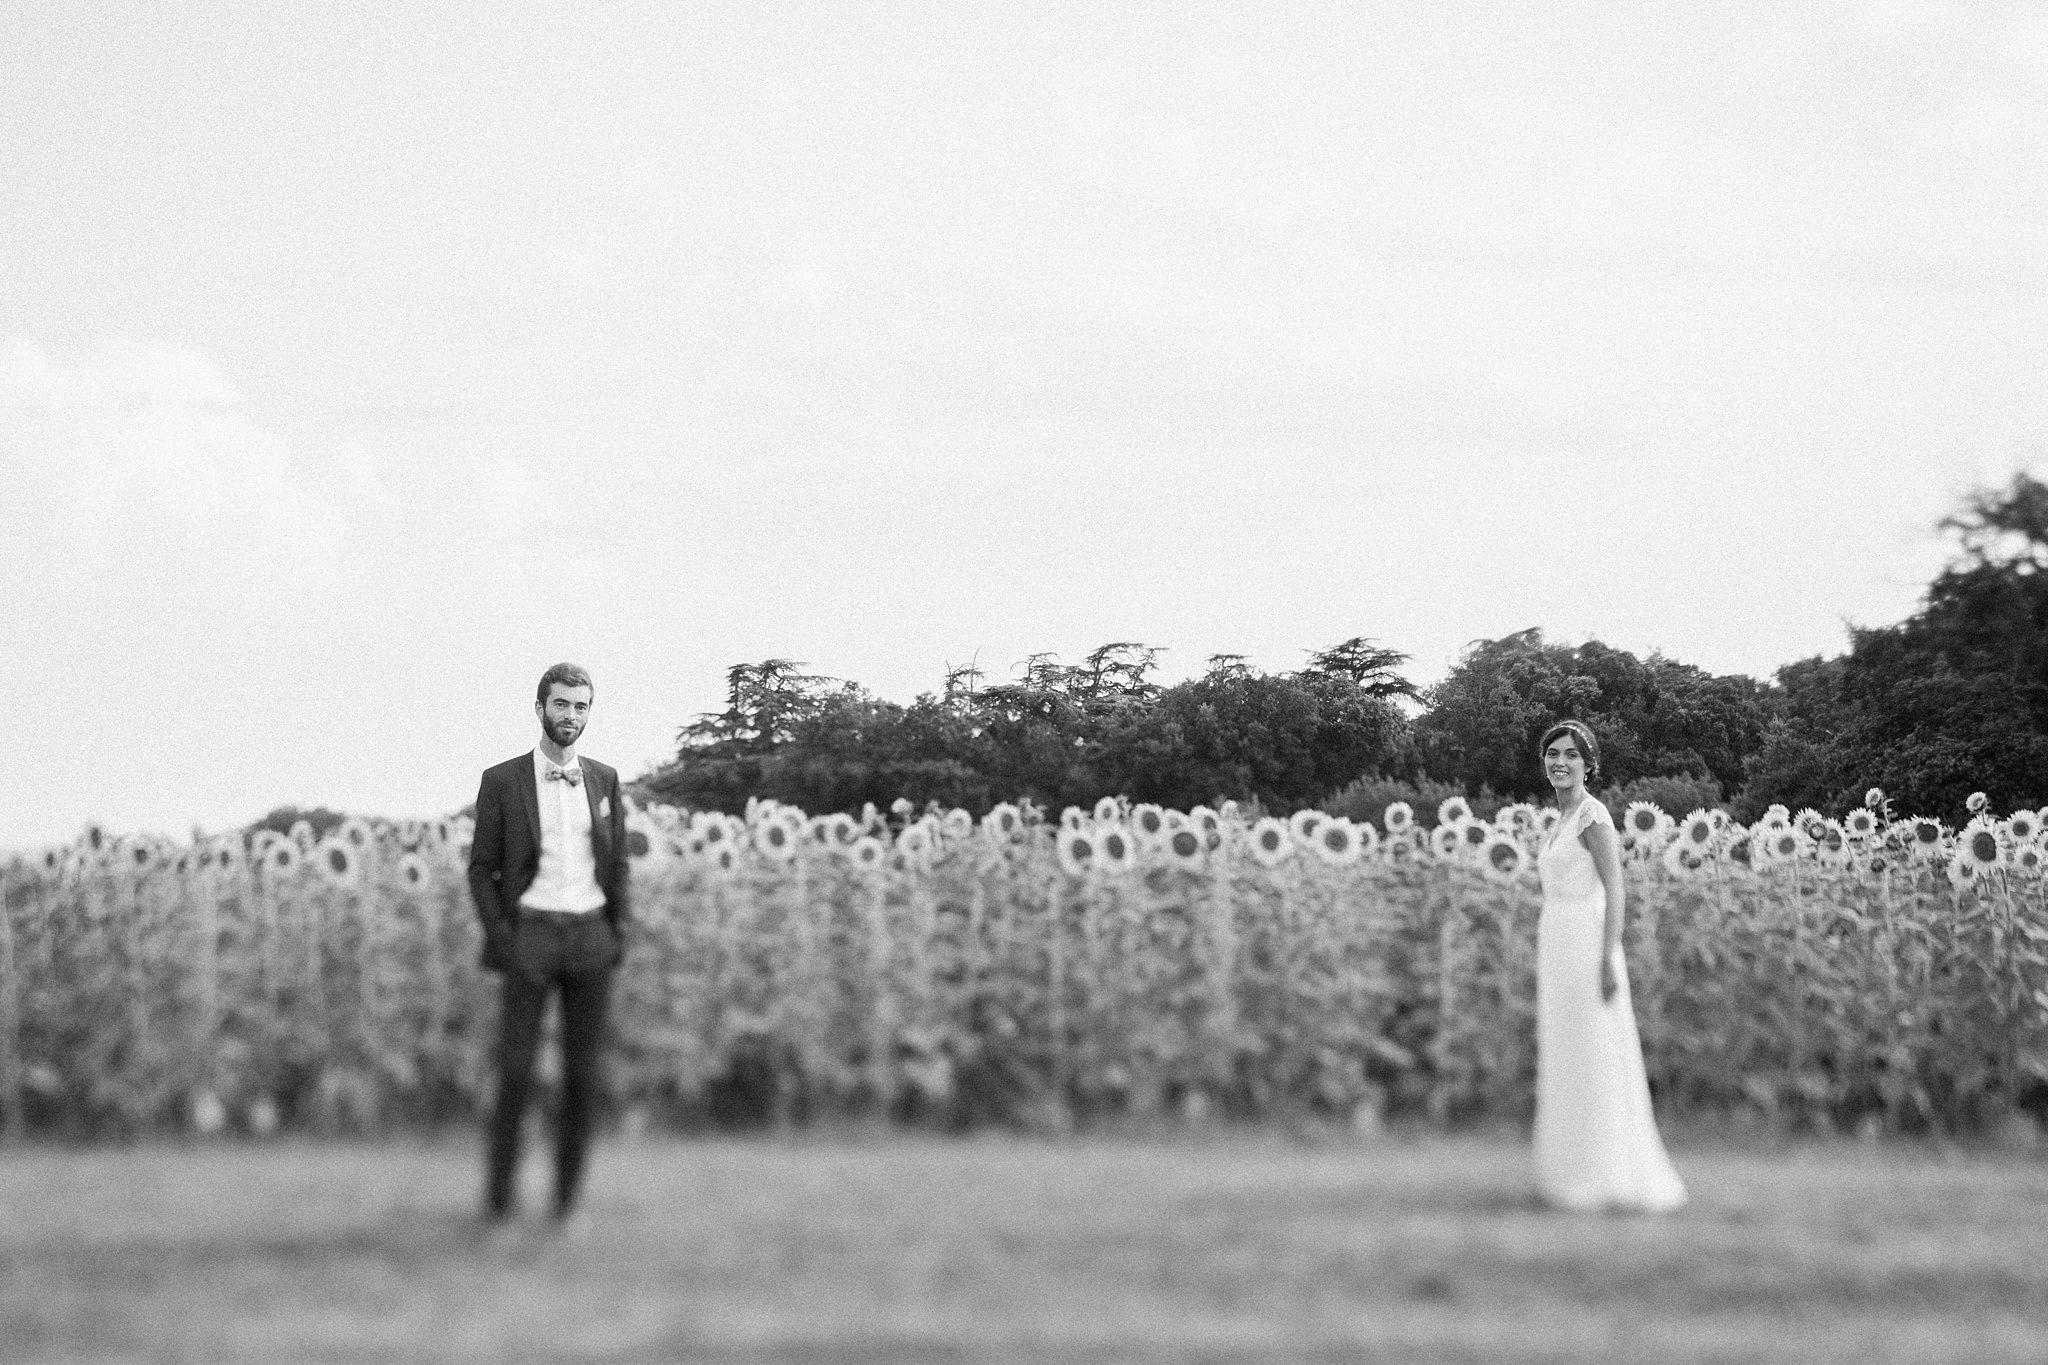 Mariage-a-la-maison-secall-hugo-hennequin-photographe-mariage-perpignan_0097.jpg